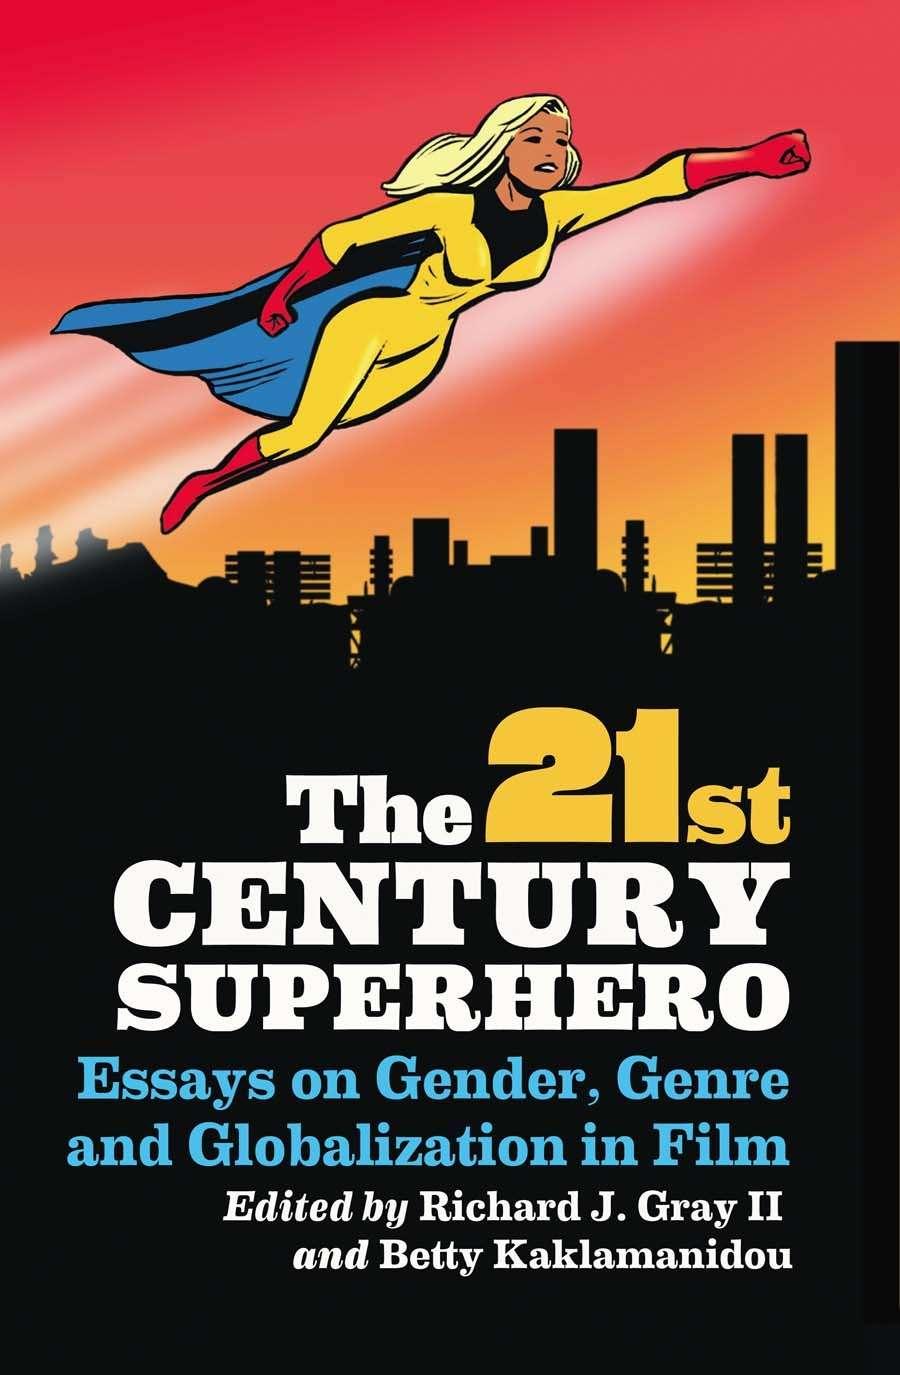 Normalizing Male Dominance: Gender Representation in 2012 Films